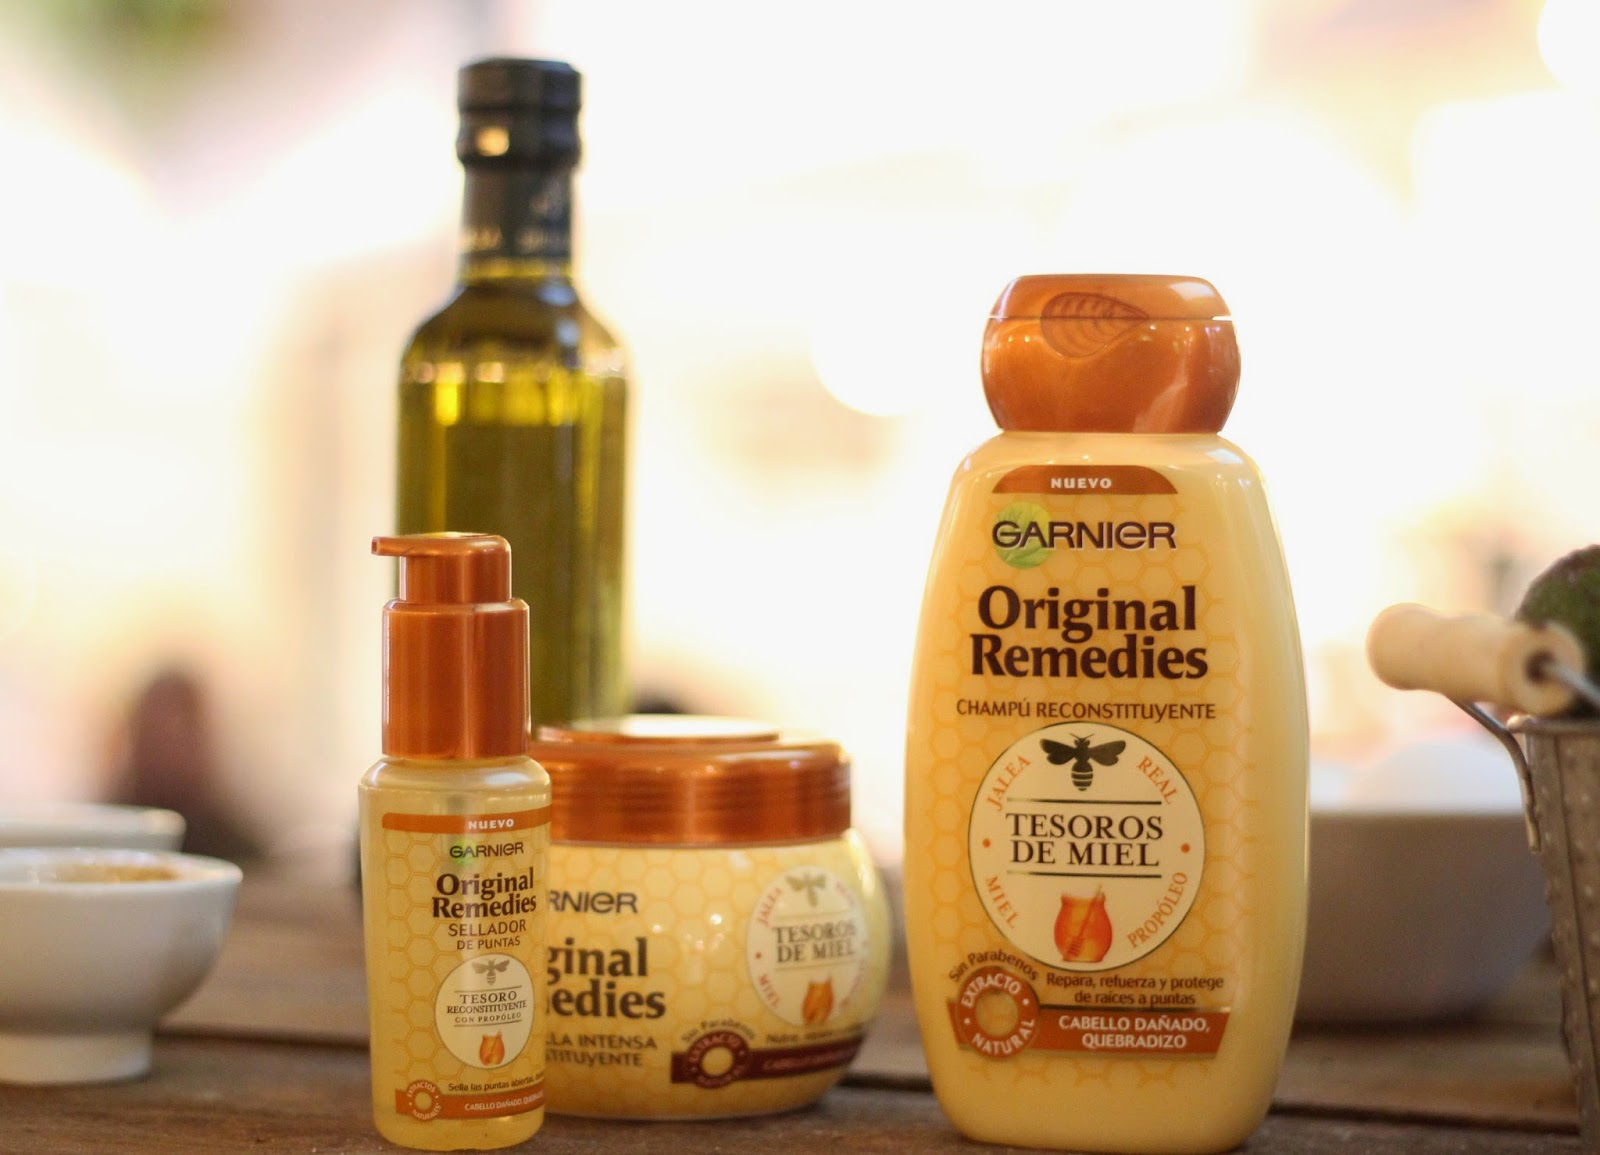 Original remedies